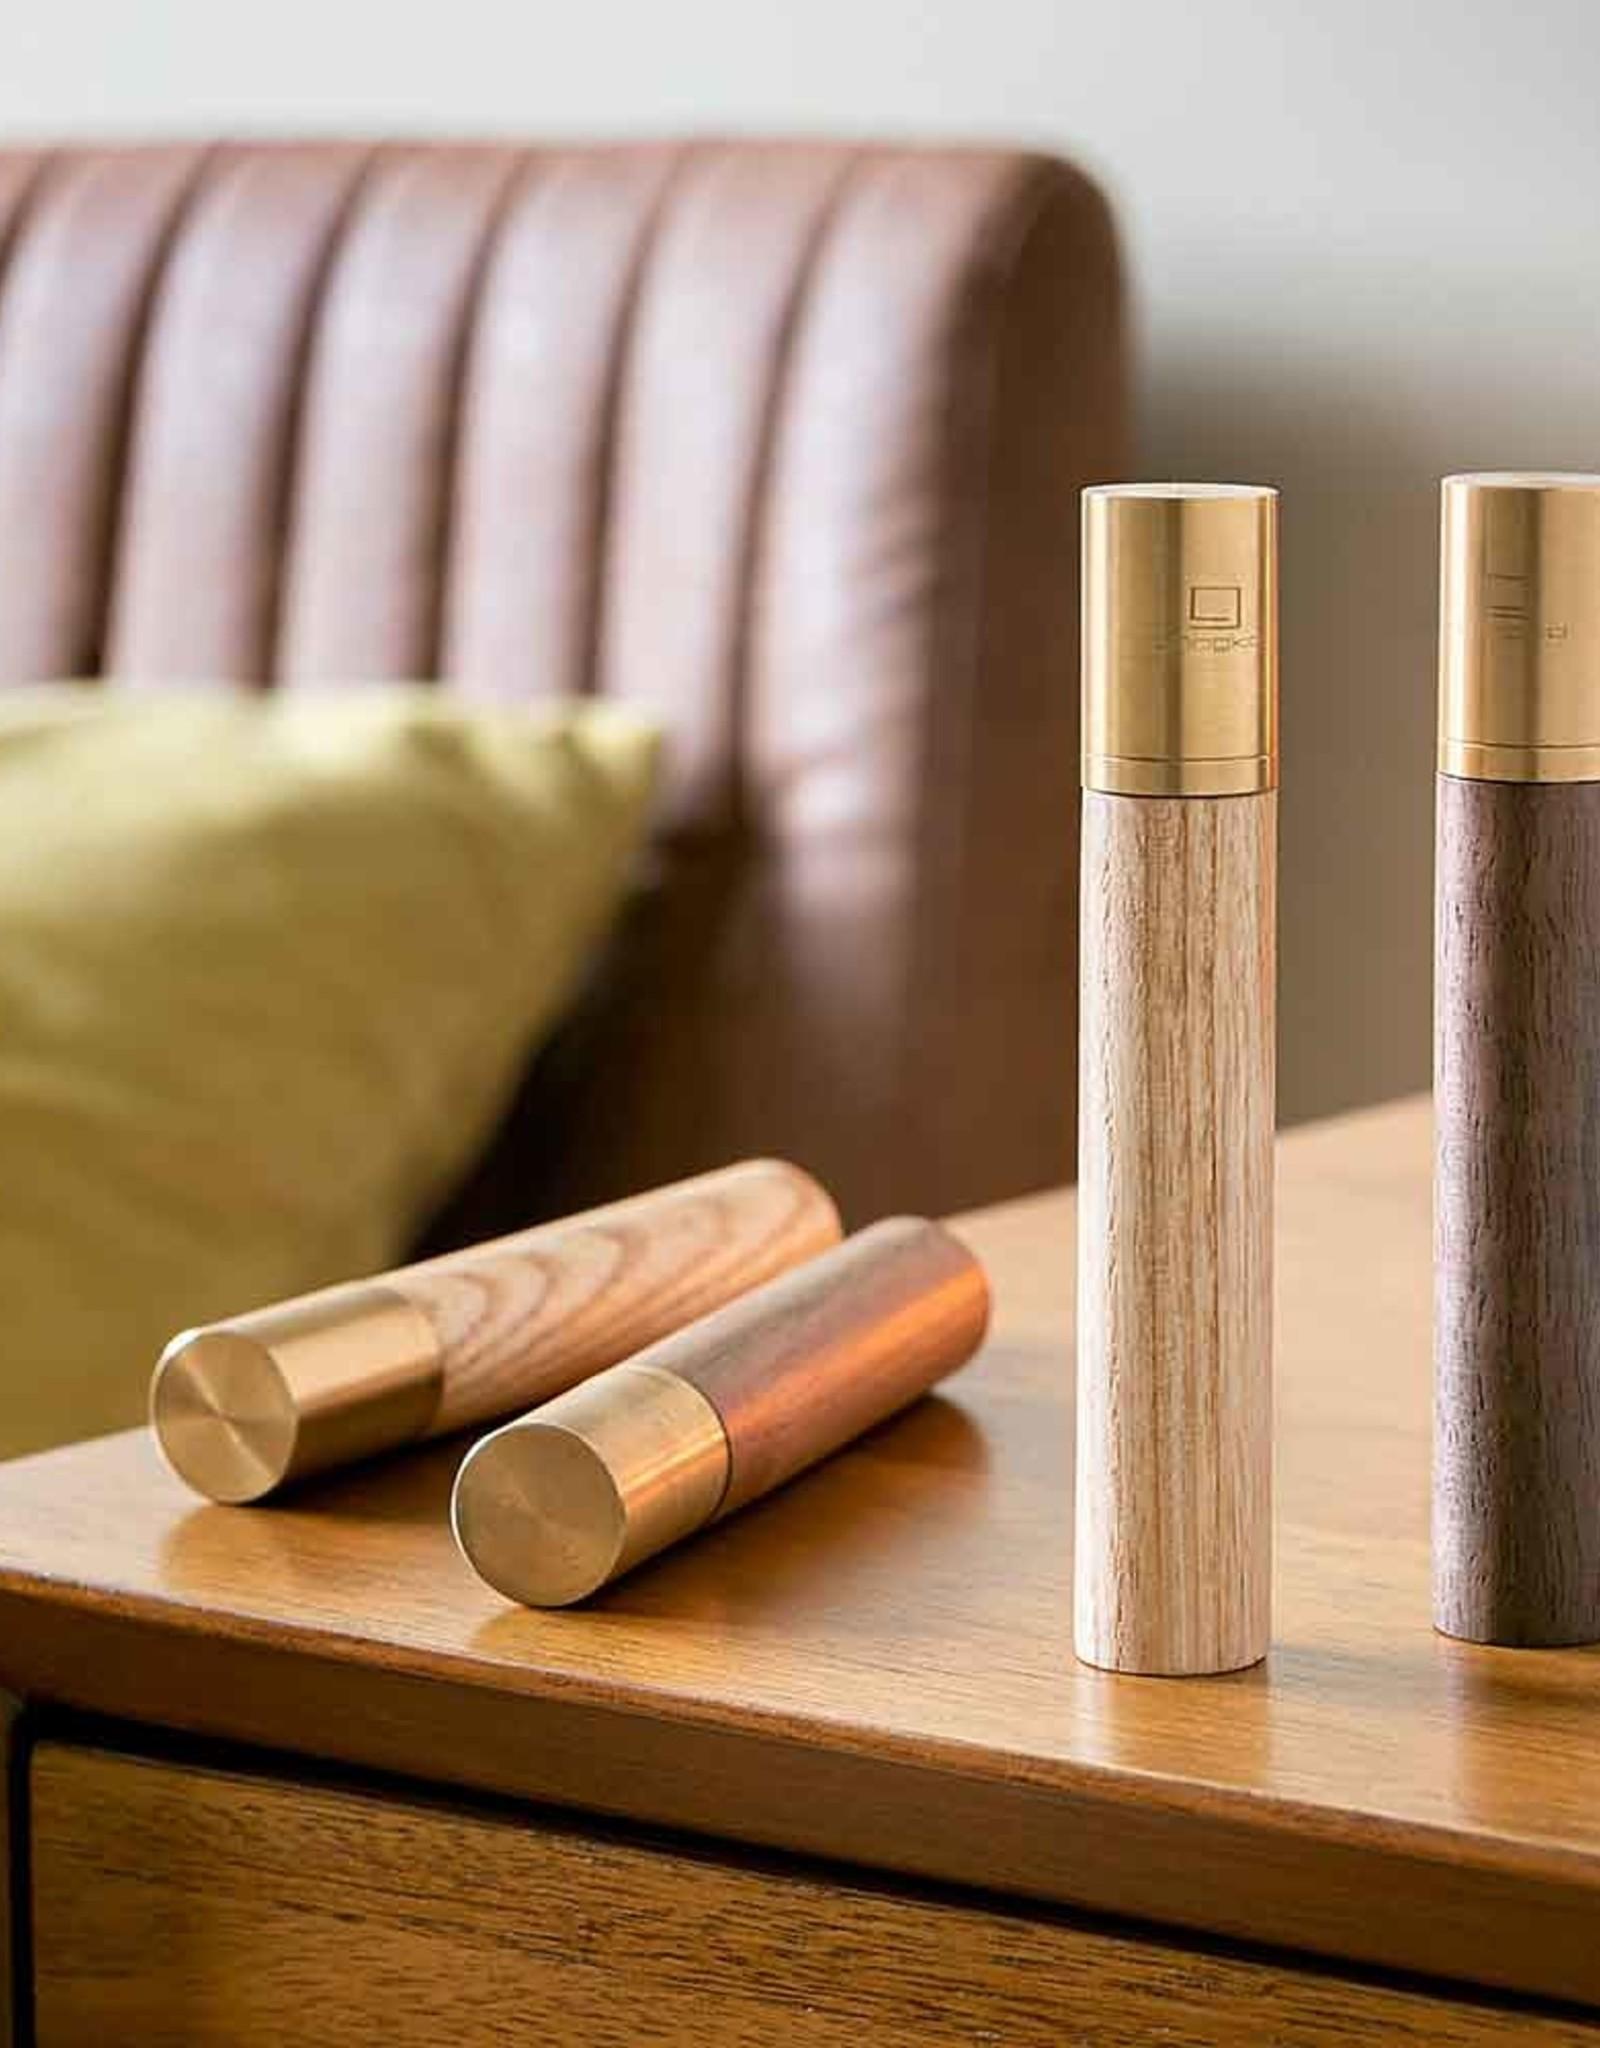 Gingko Flameless Lighter Ash L: 10.3cm x W: 1.7cm x D: 1.7cm